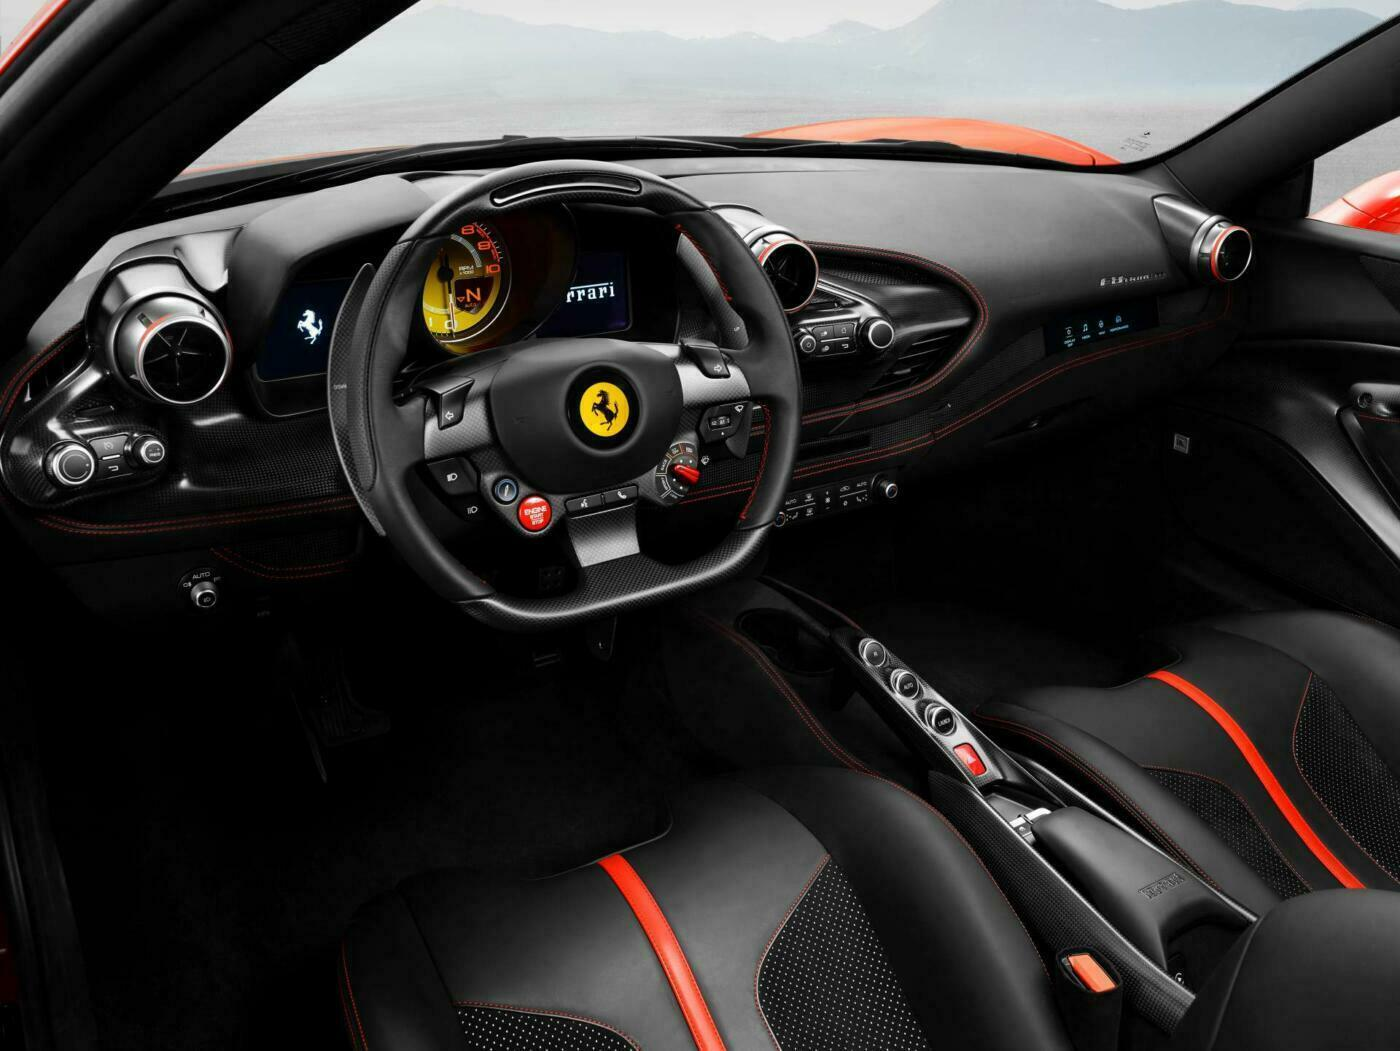 Ferrari F8 Tributo Spider render